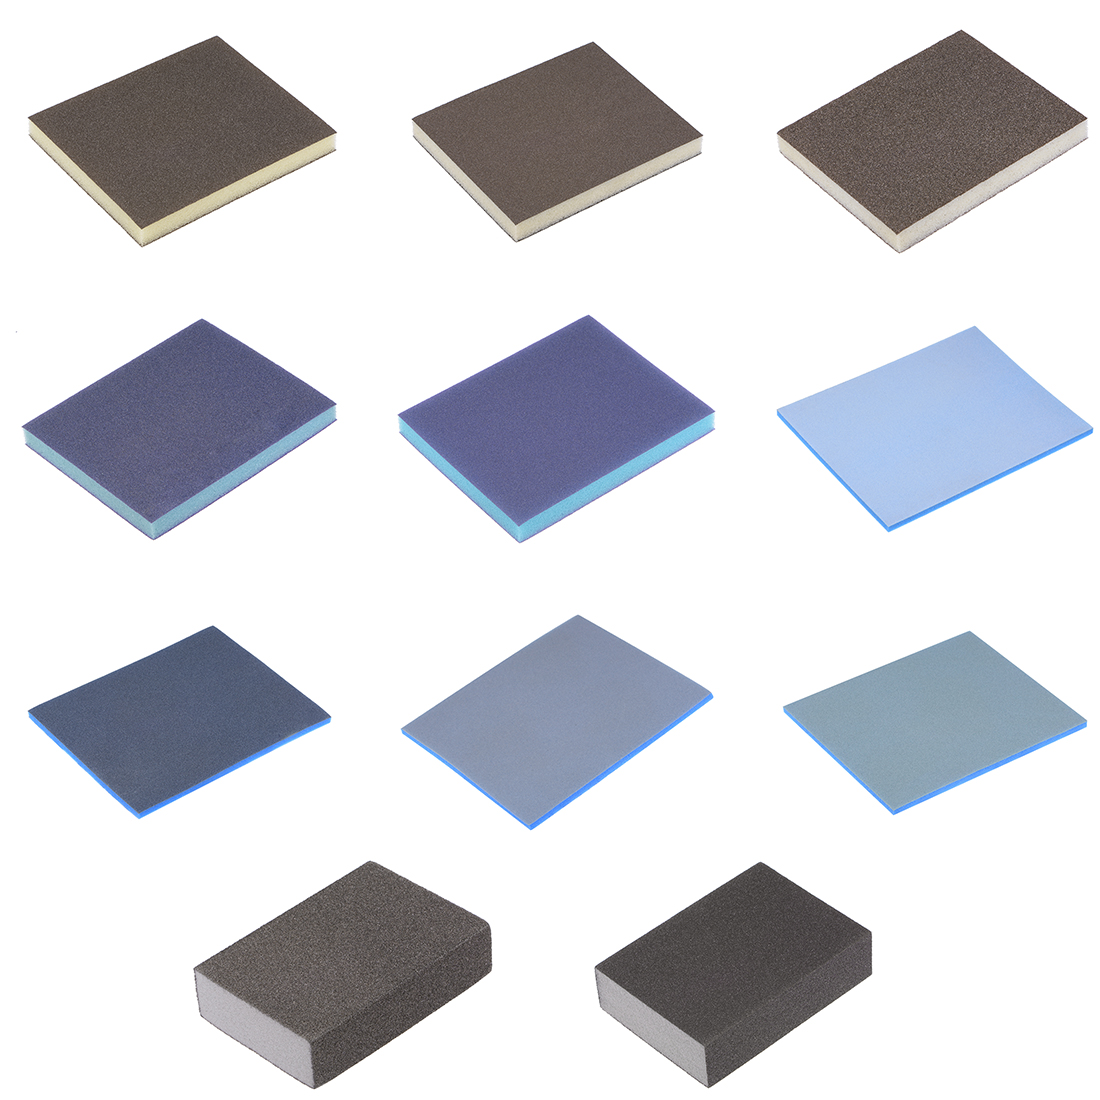 Uxcell Aluminum Oxide Sanding Sponge Block For Wood Paint Metal Sanding Wood Paint Metal Plastic And Drywall Aluminum Oxide